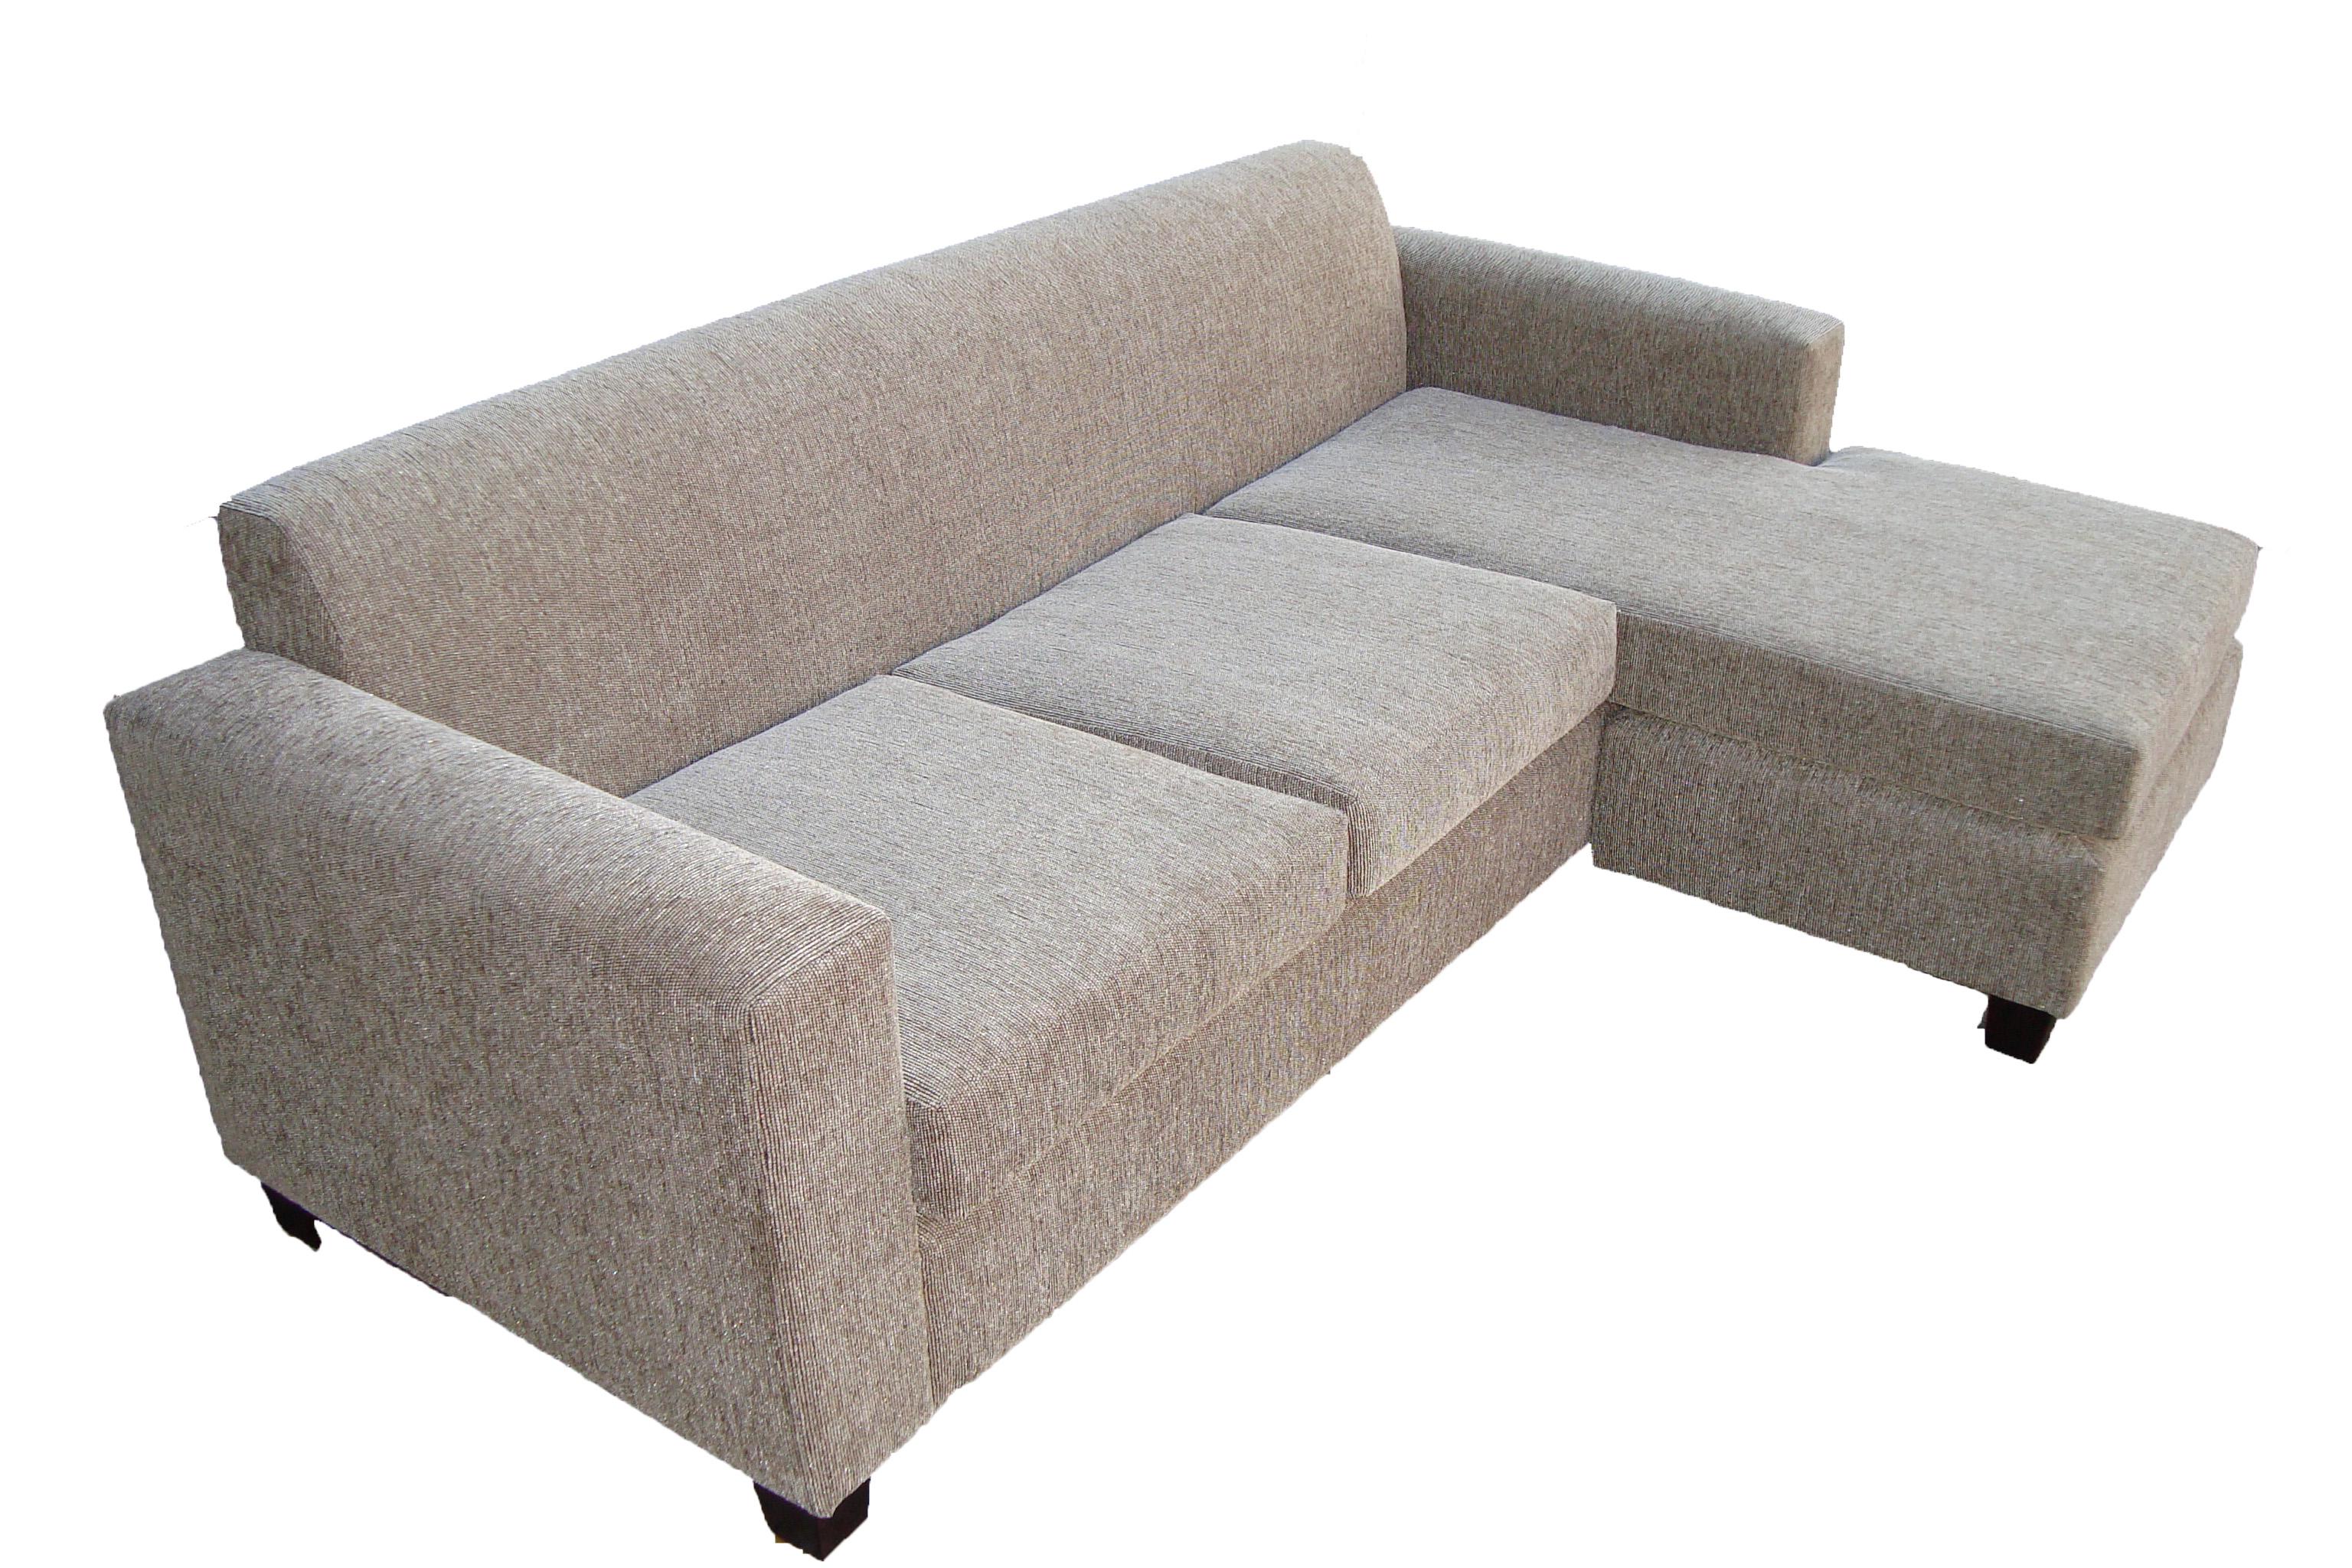 Gl Furniture The Australian Made Campaign